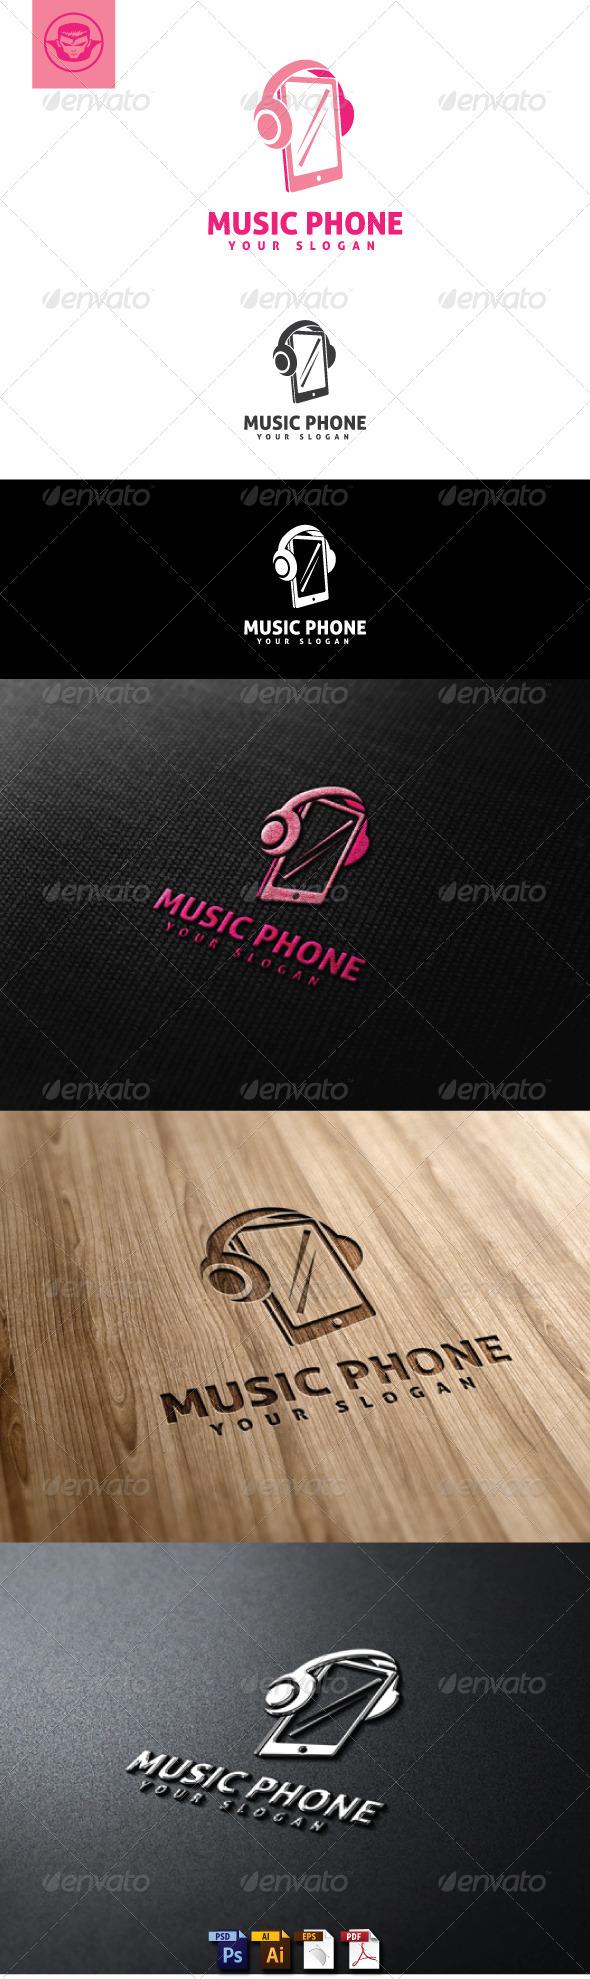 Music Phone Logo Template